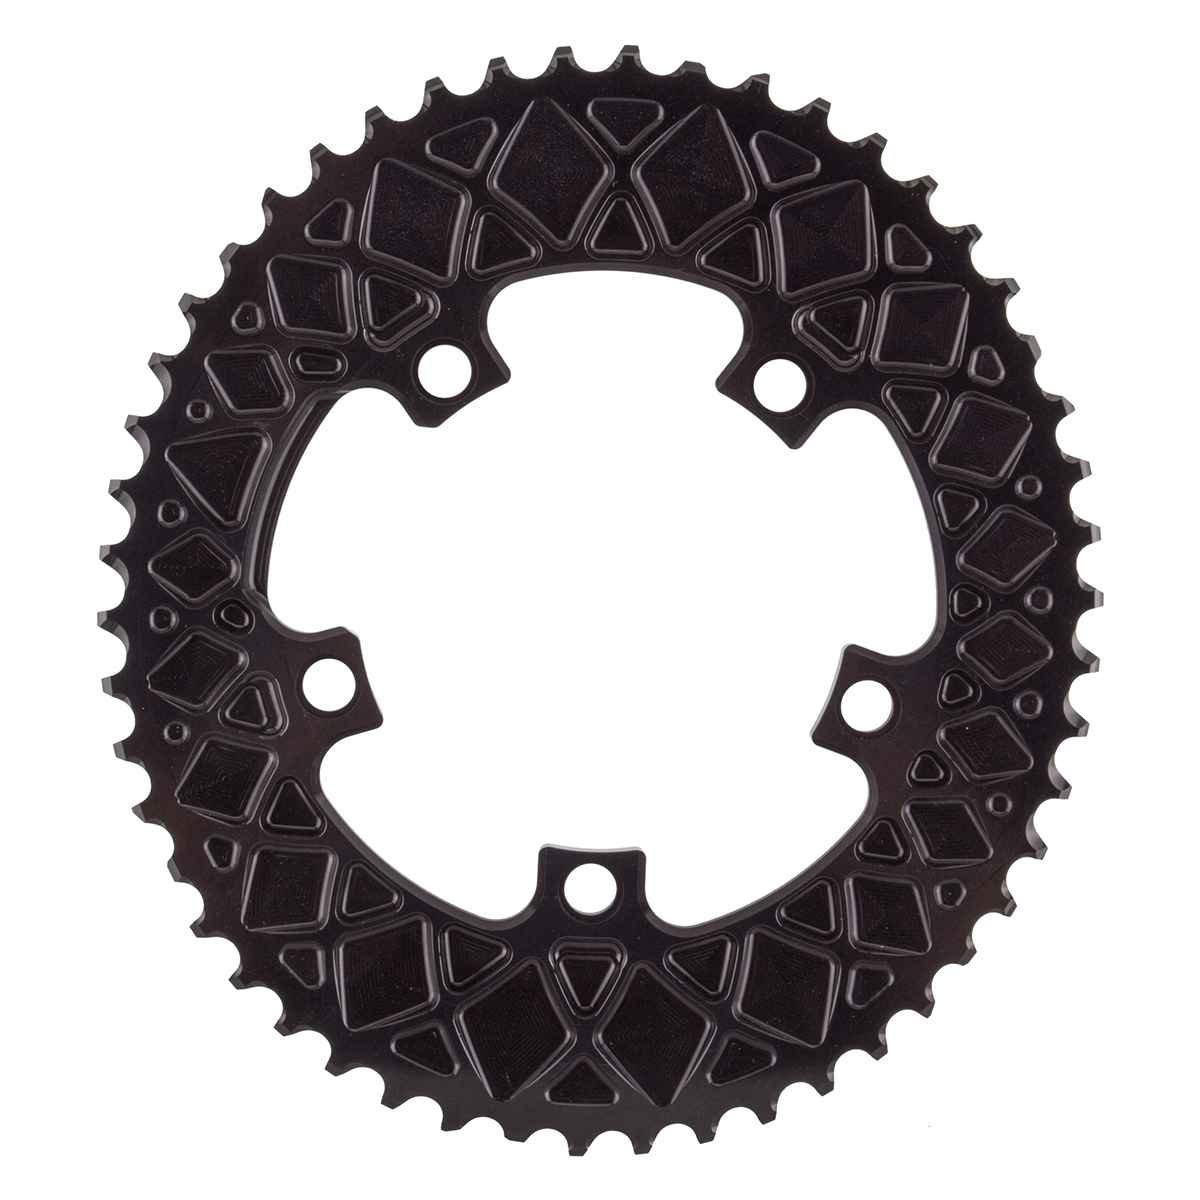 Absolute Black(アブソリュートブラック)ROV50/5BK Ovalチェーンリング ROAD 50T 110PCD 5アーム用 ブラック B01GQWH7WO